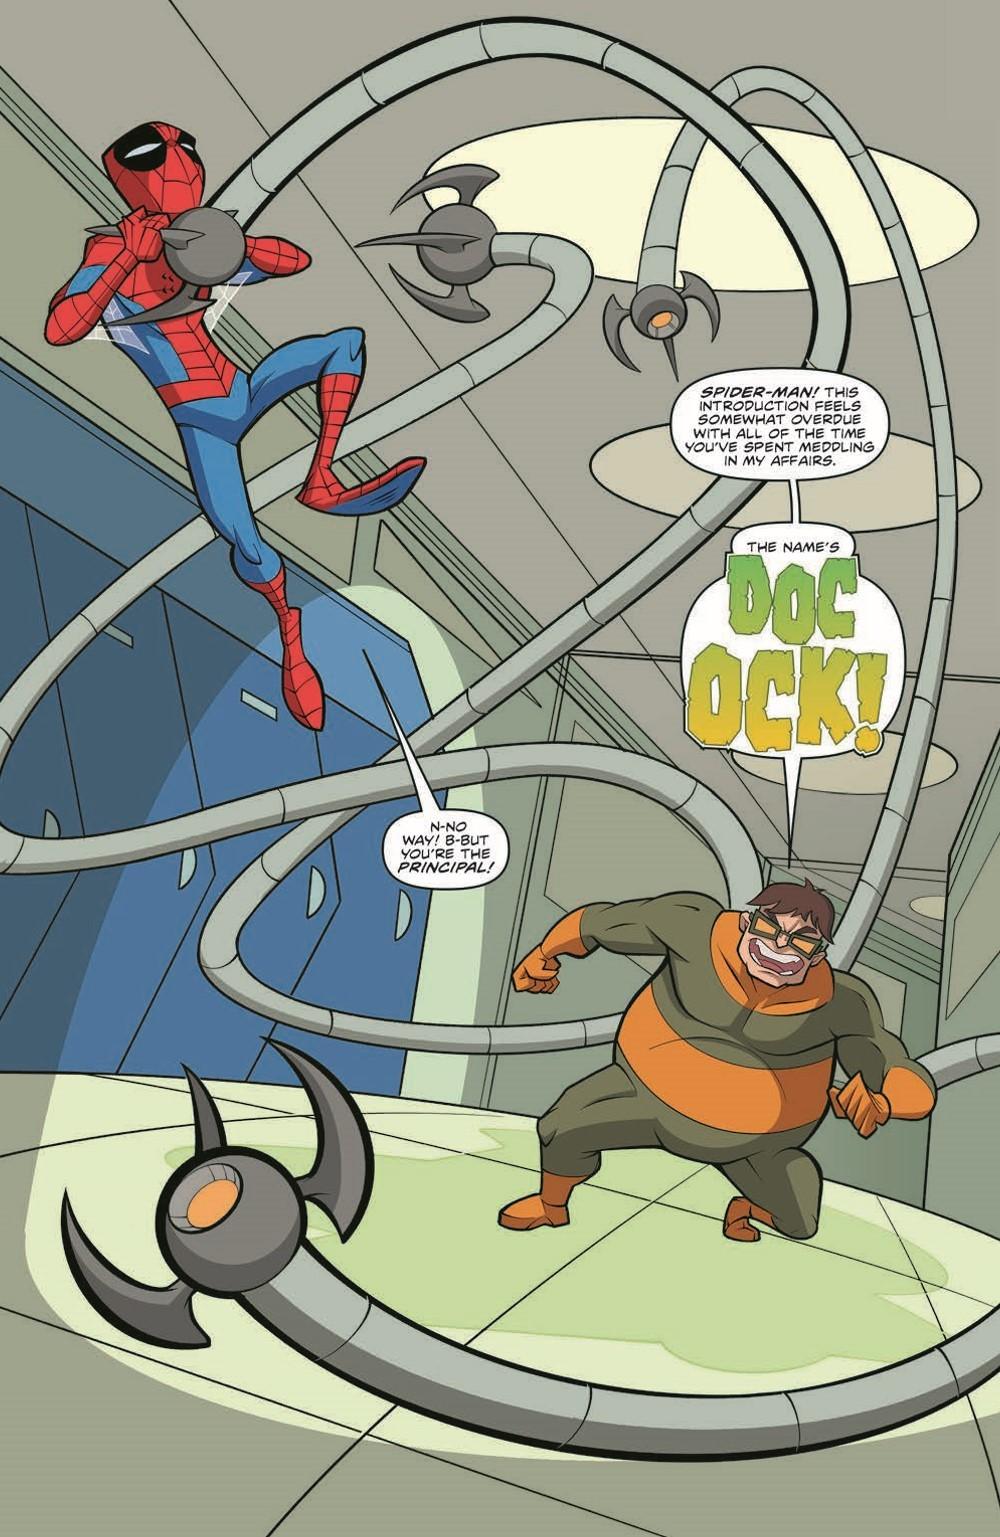 SpidermanV3-05_pr-7 ComicList Previews: MARVEL ACTION SPIDER-MAN VOLUME 3 #5